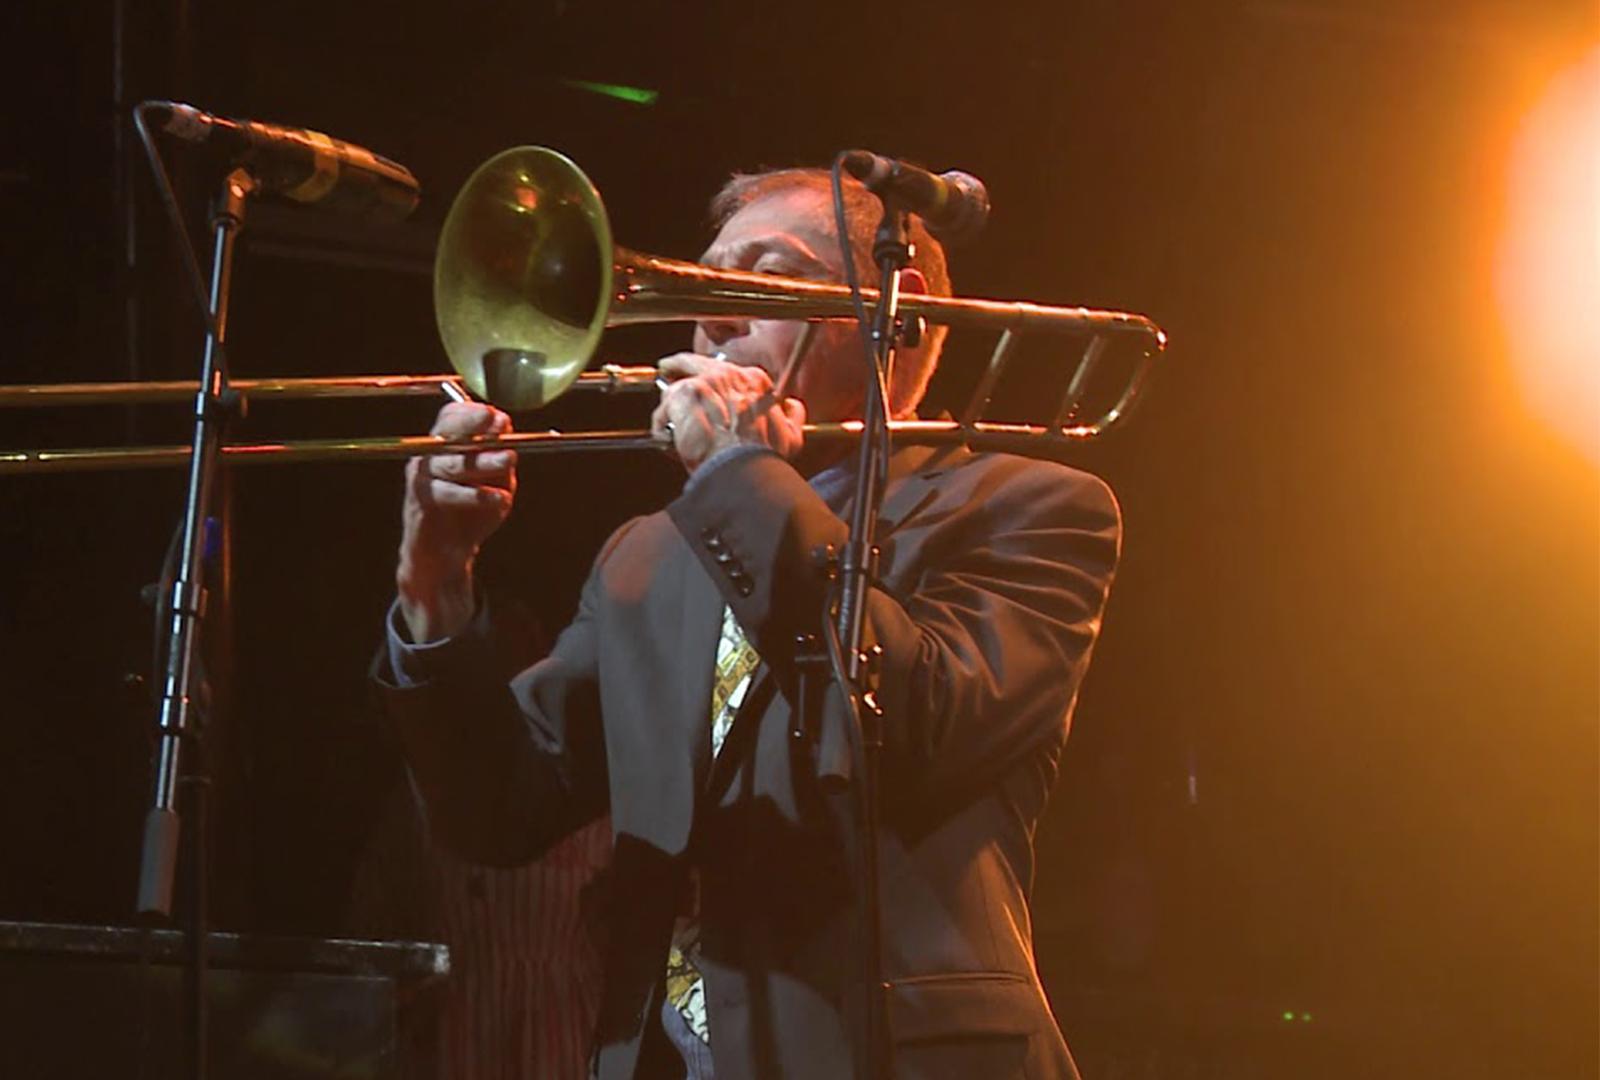 Trombonist Peter Zummo and artist Jonas Pequeno collaborate on new video work